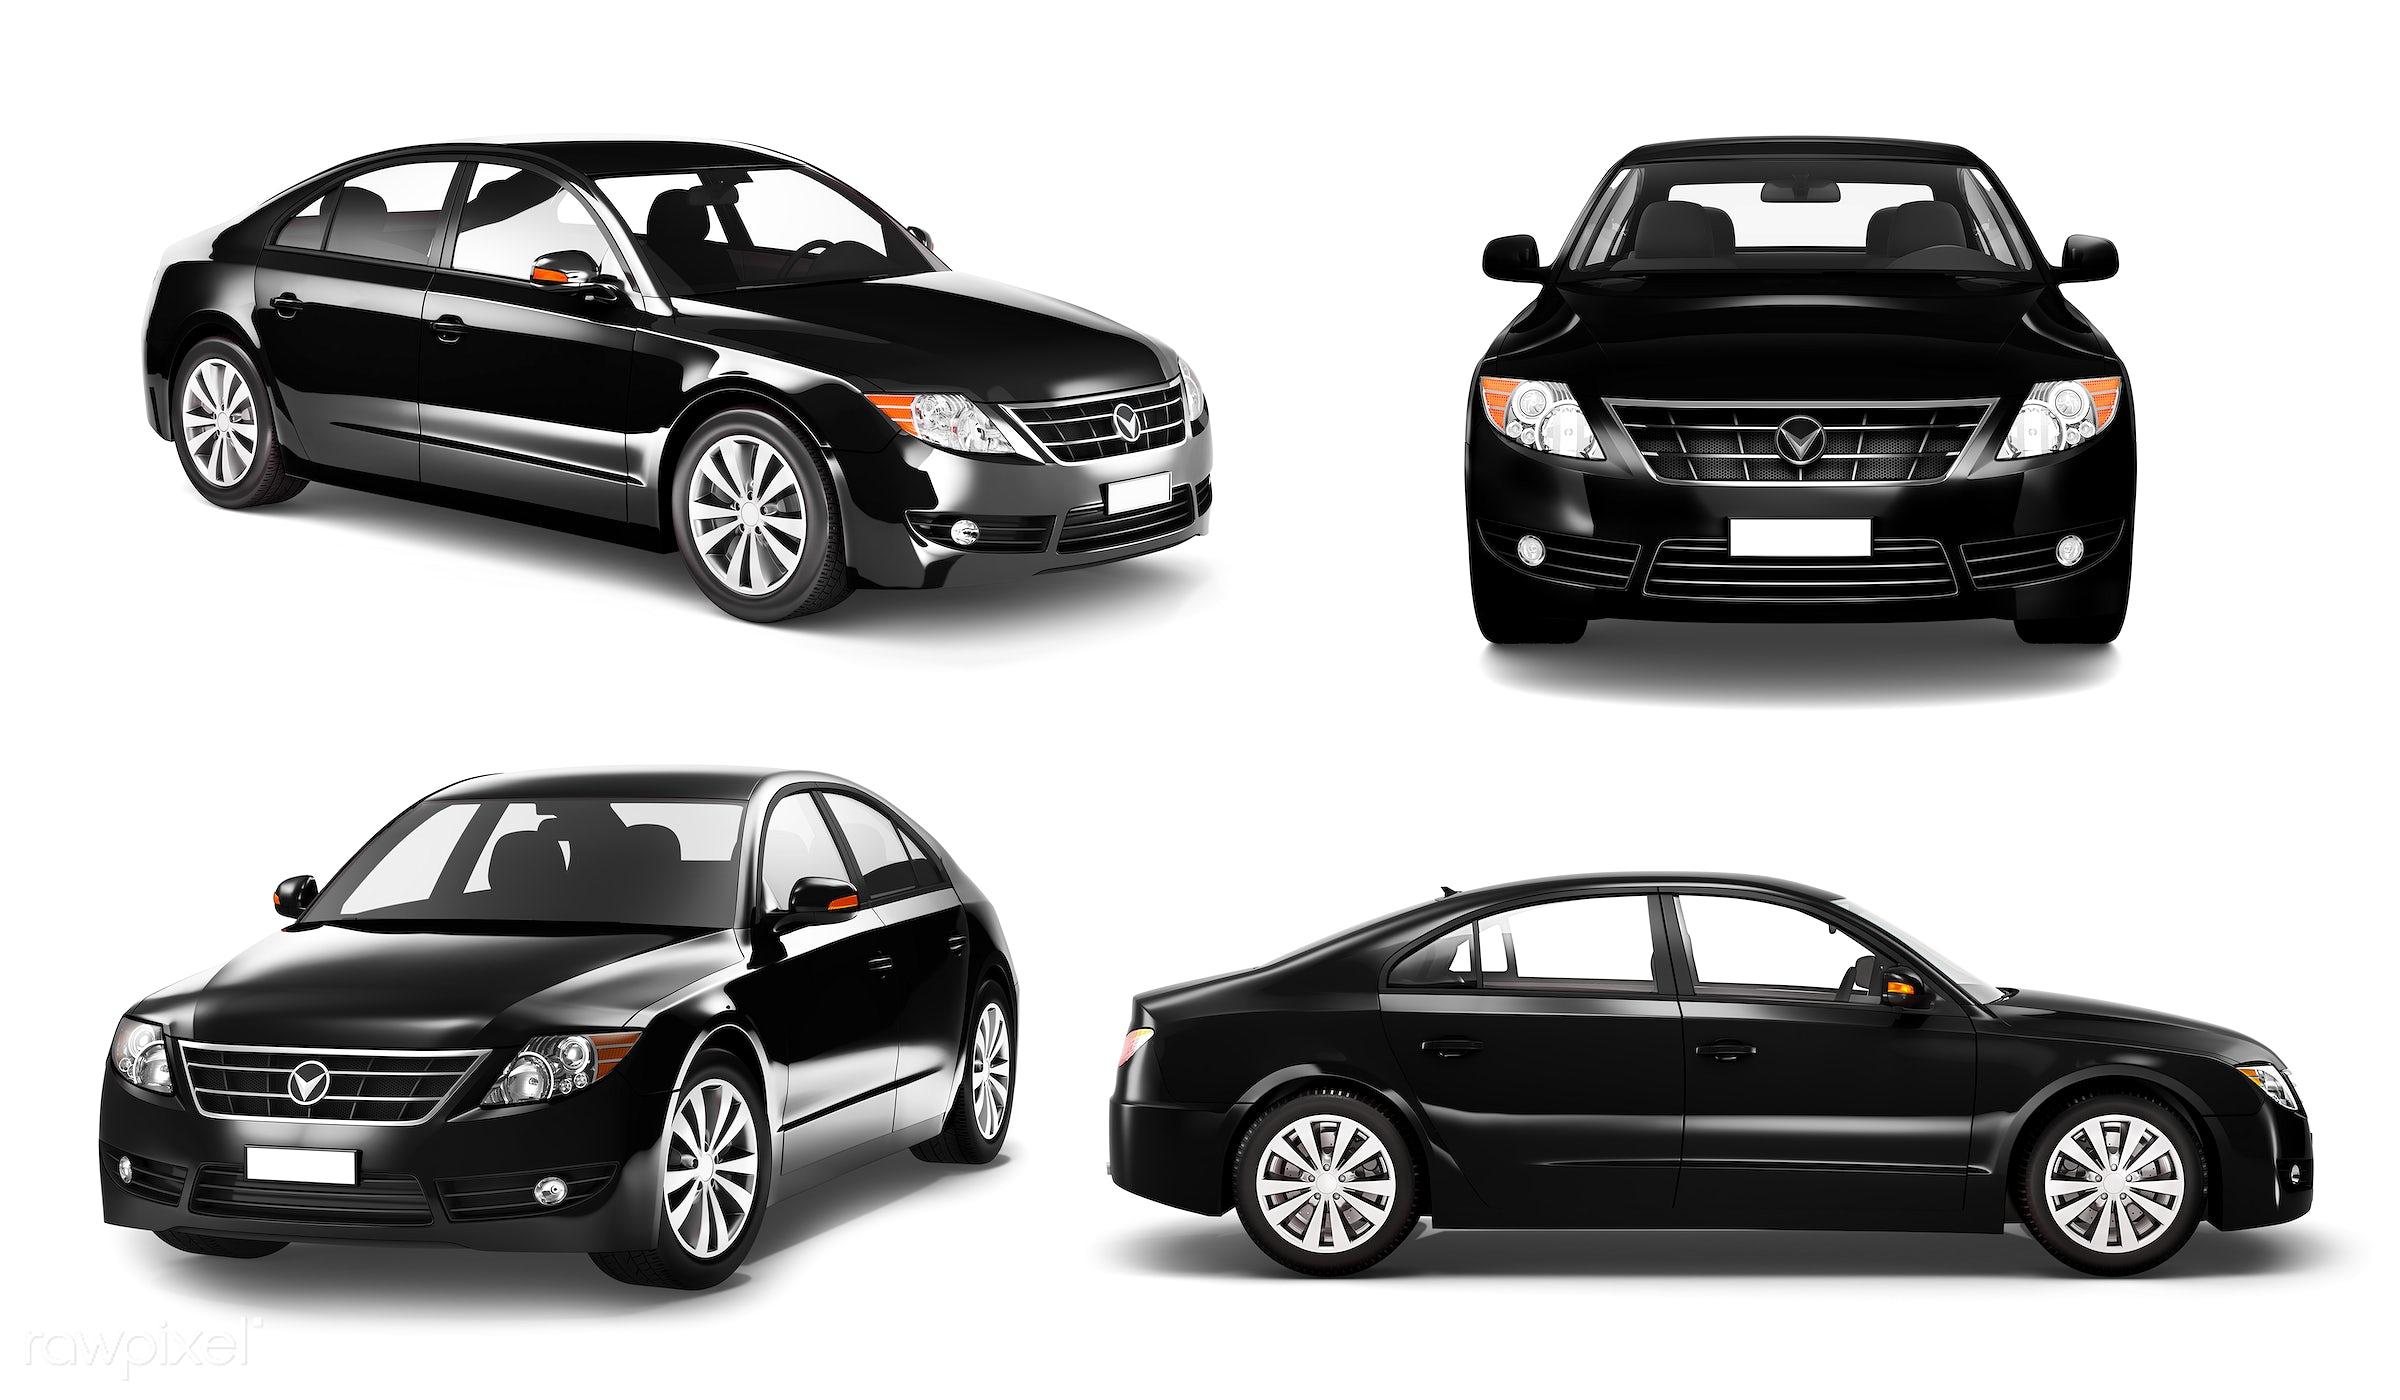 Three dimensional image of car - 3d, automobile, automotive, black, brandless, car, concept car, graphic, holiday,...